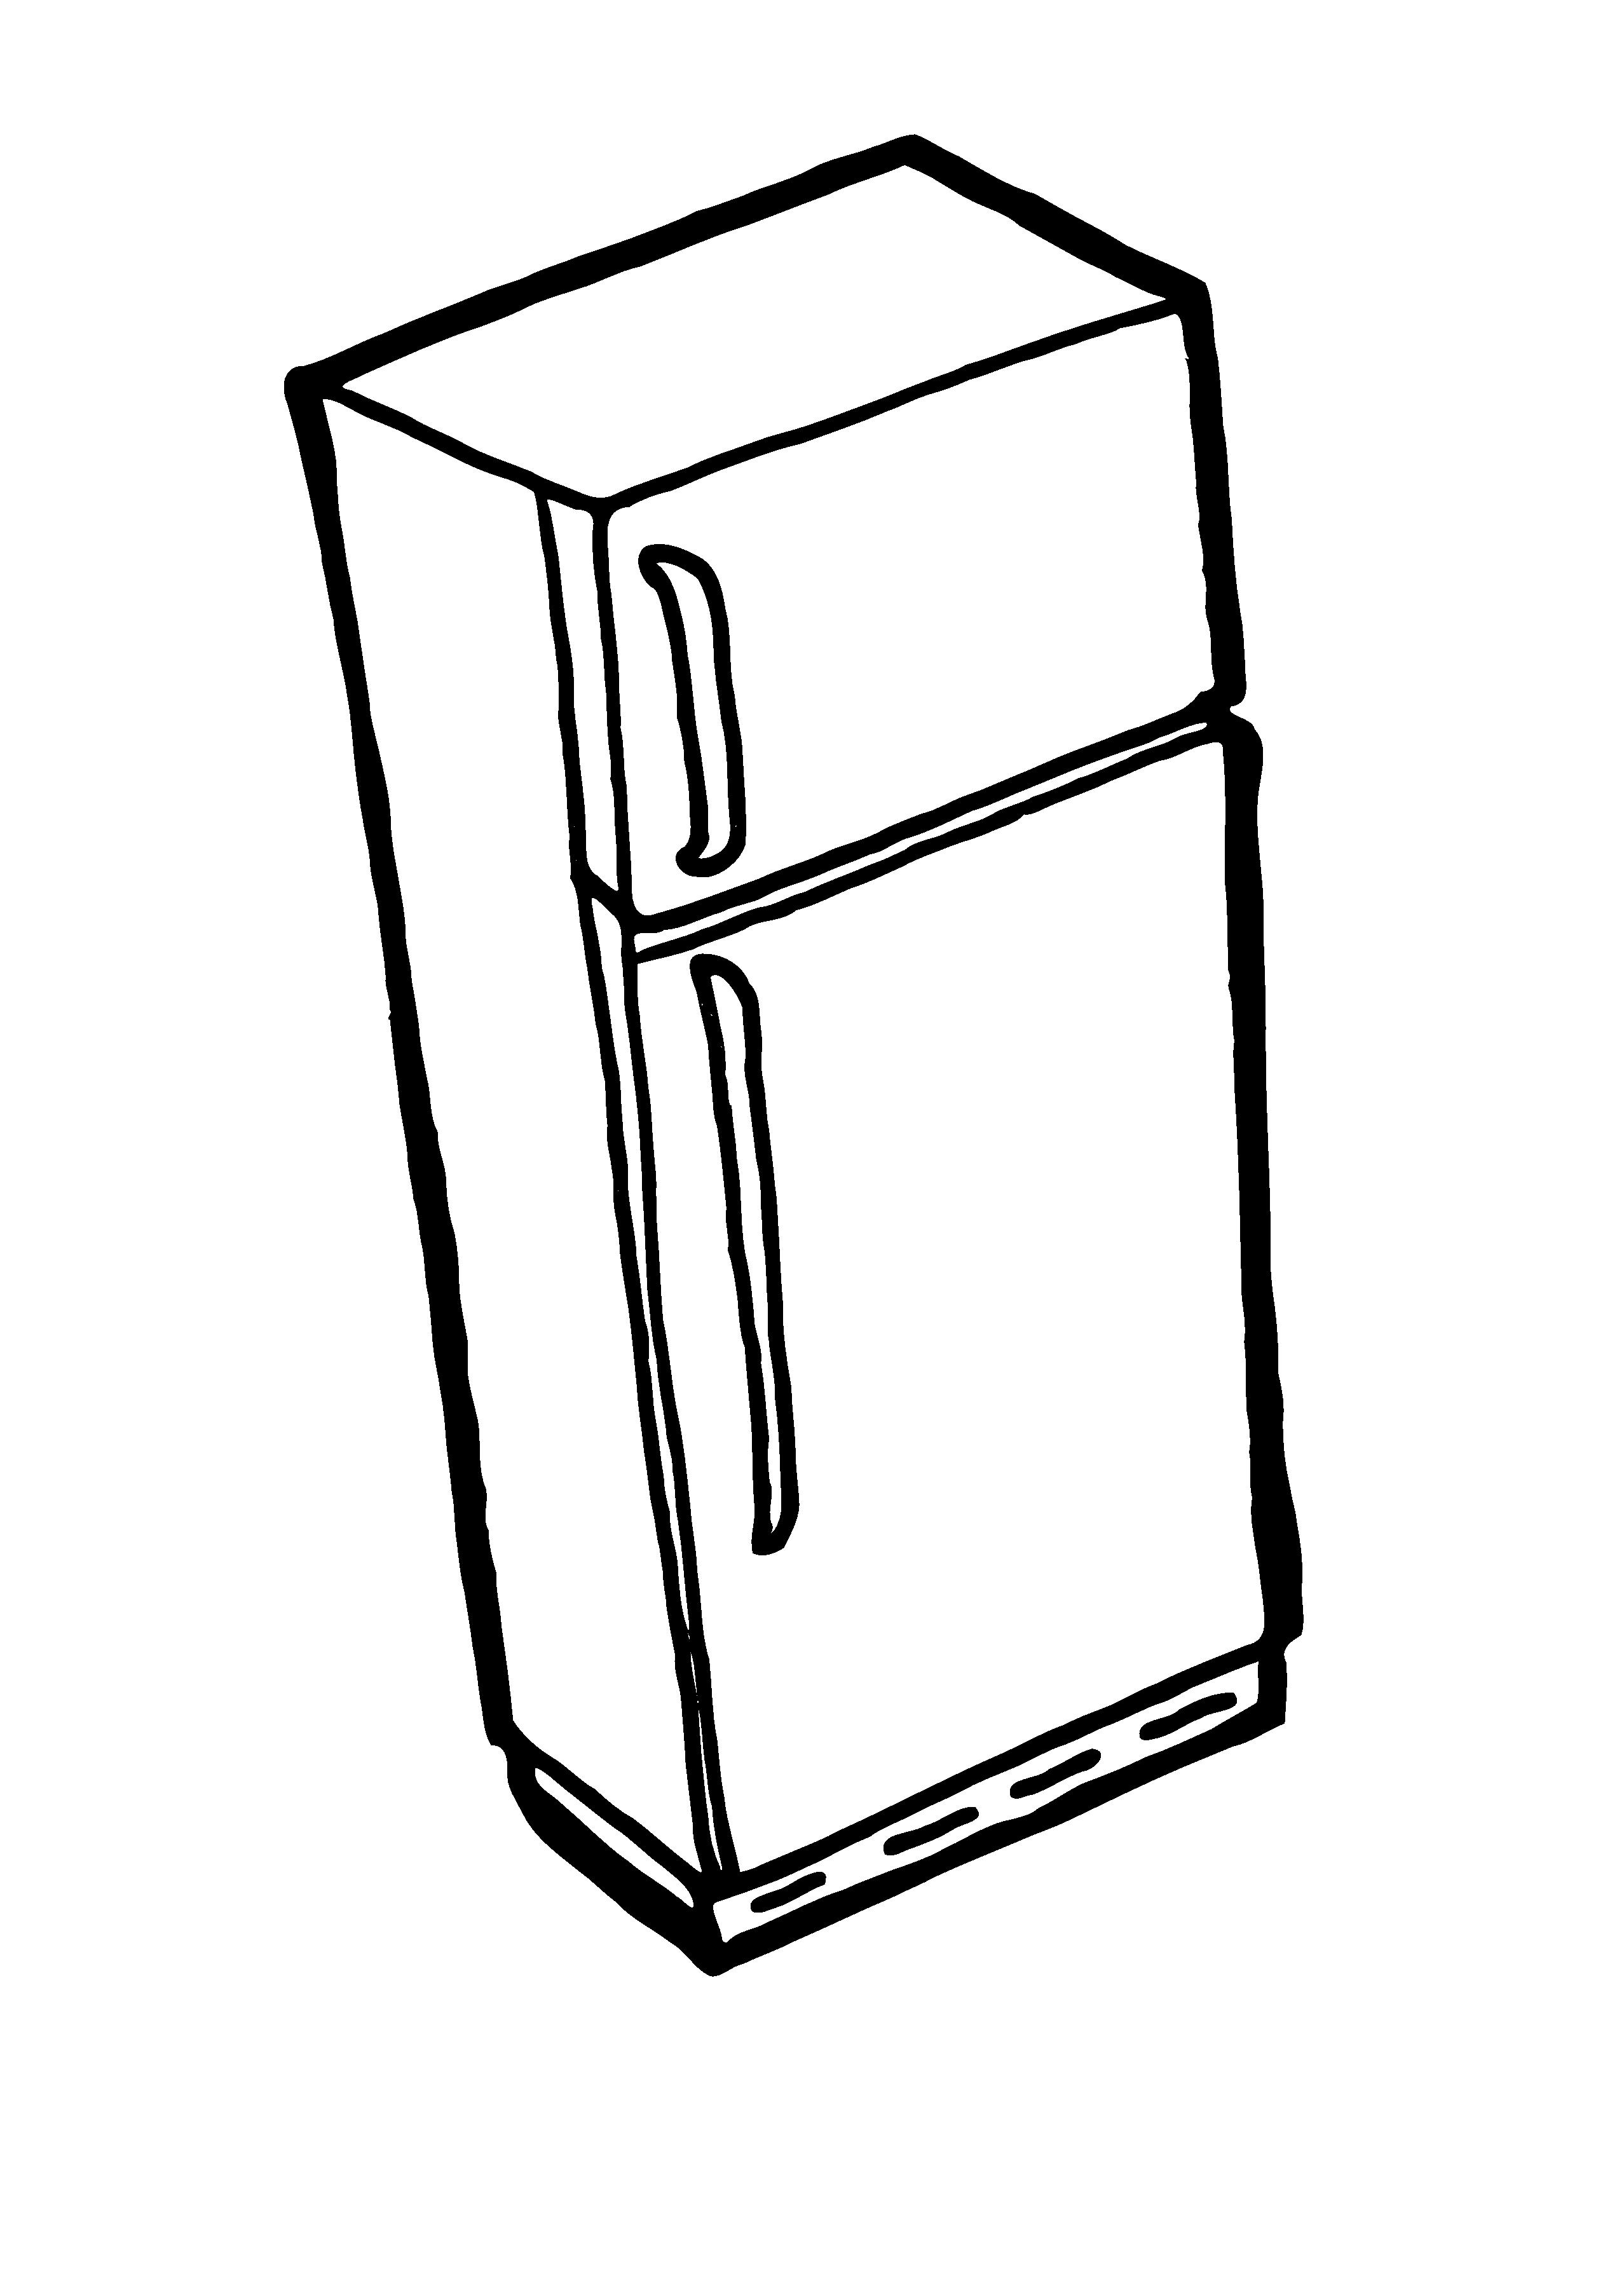 Fridge Clipart Black And White.